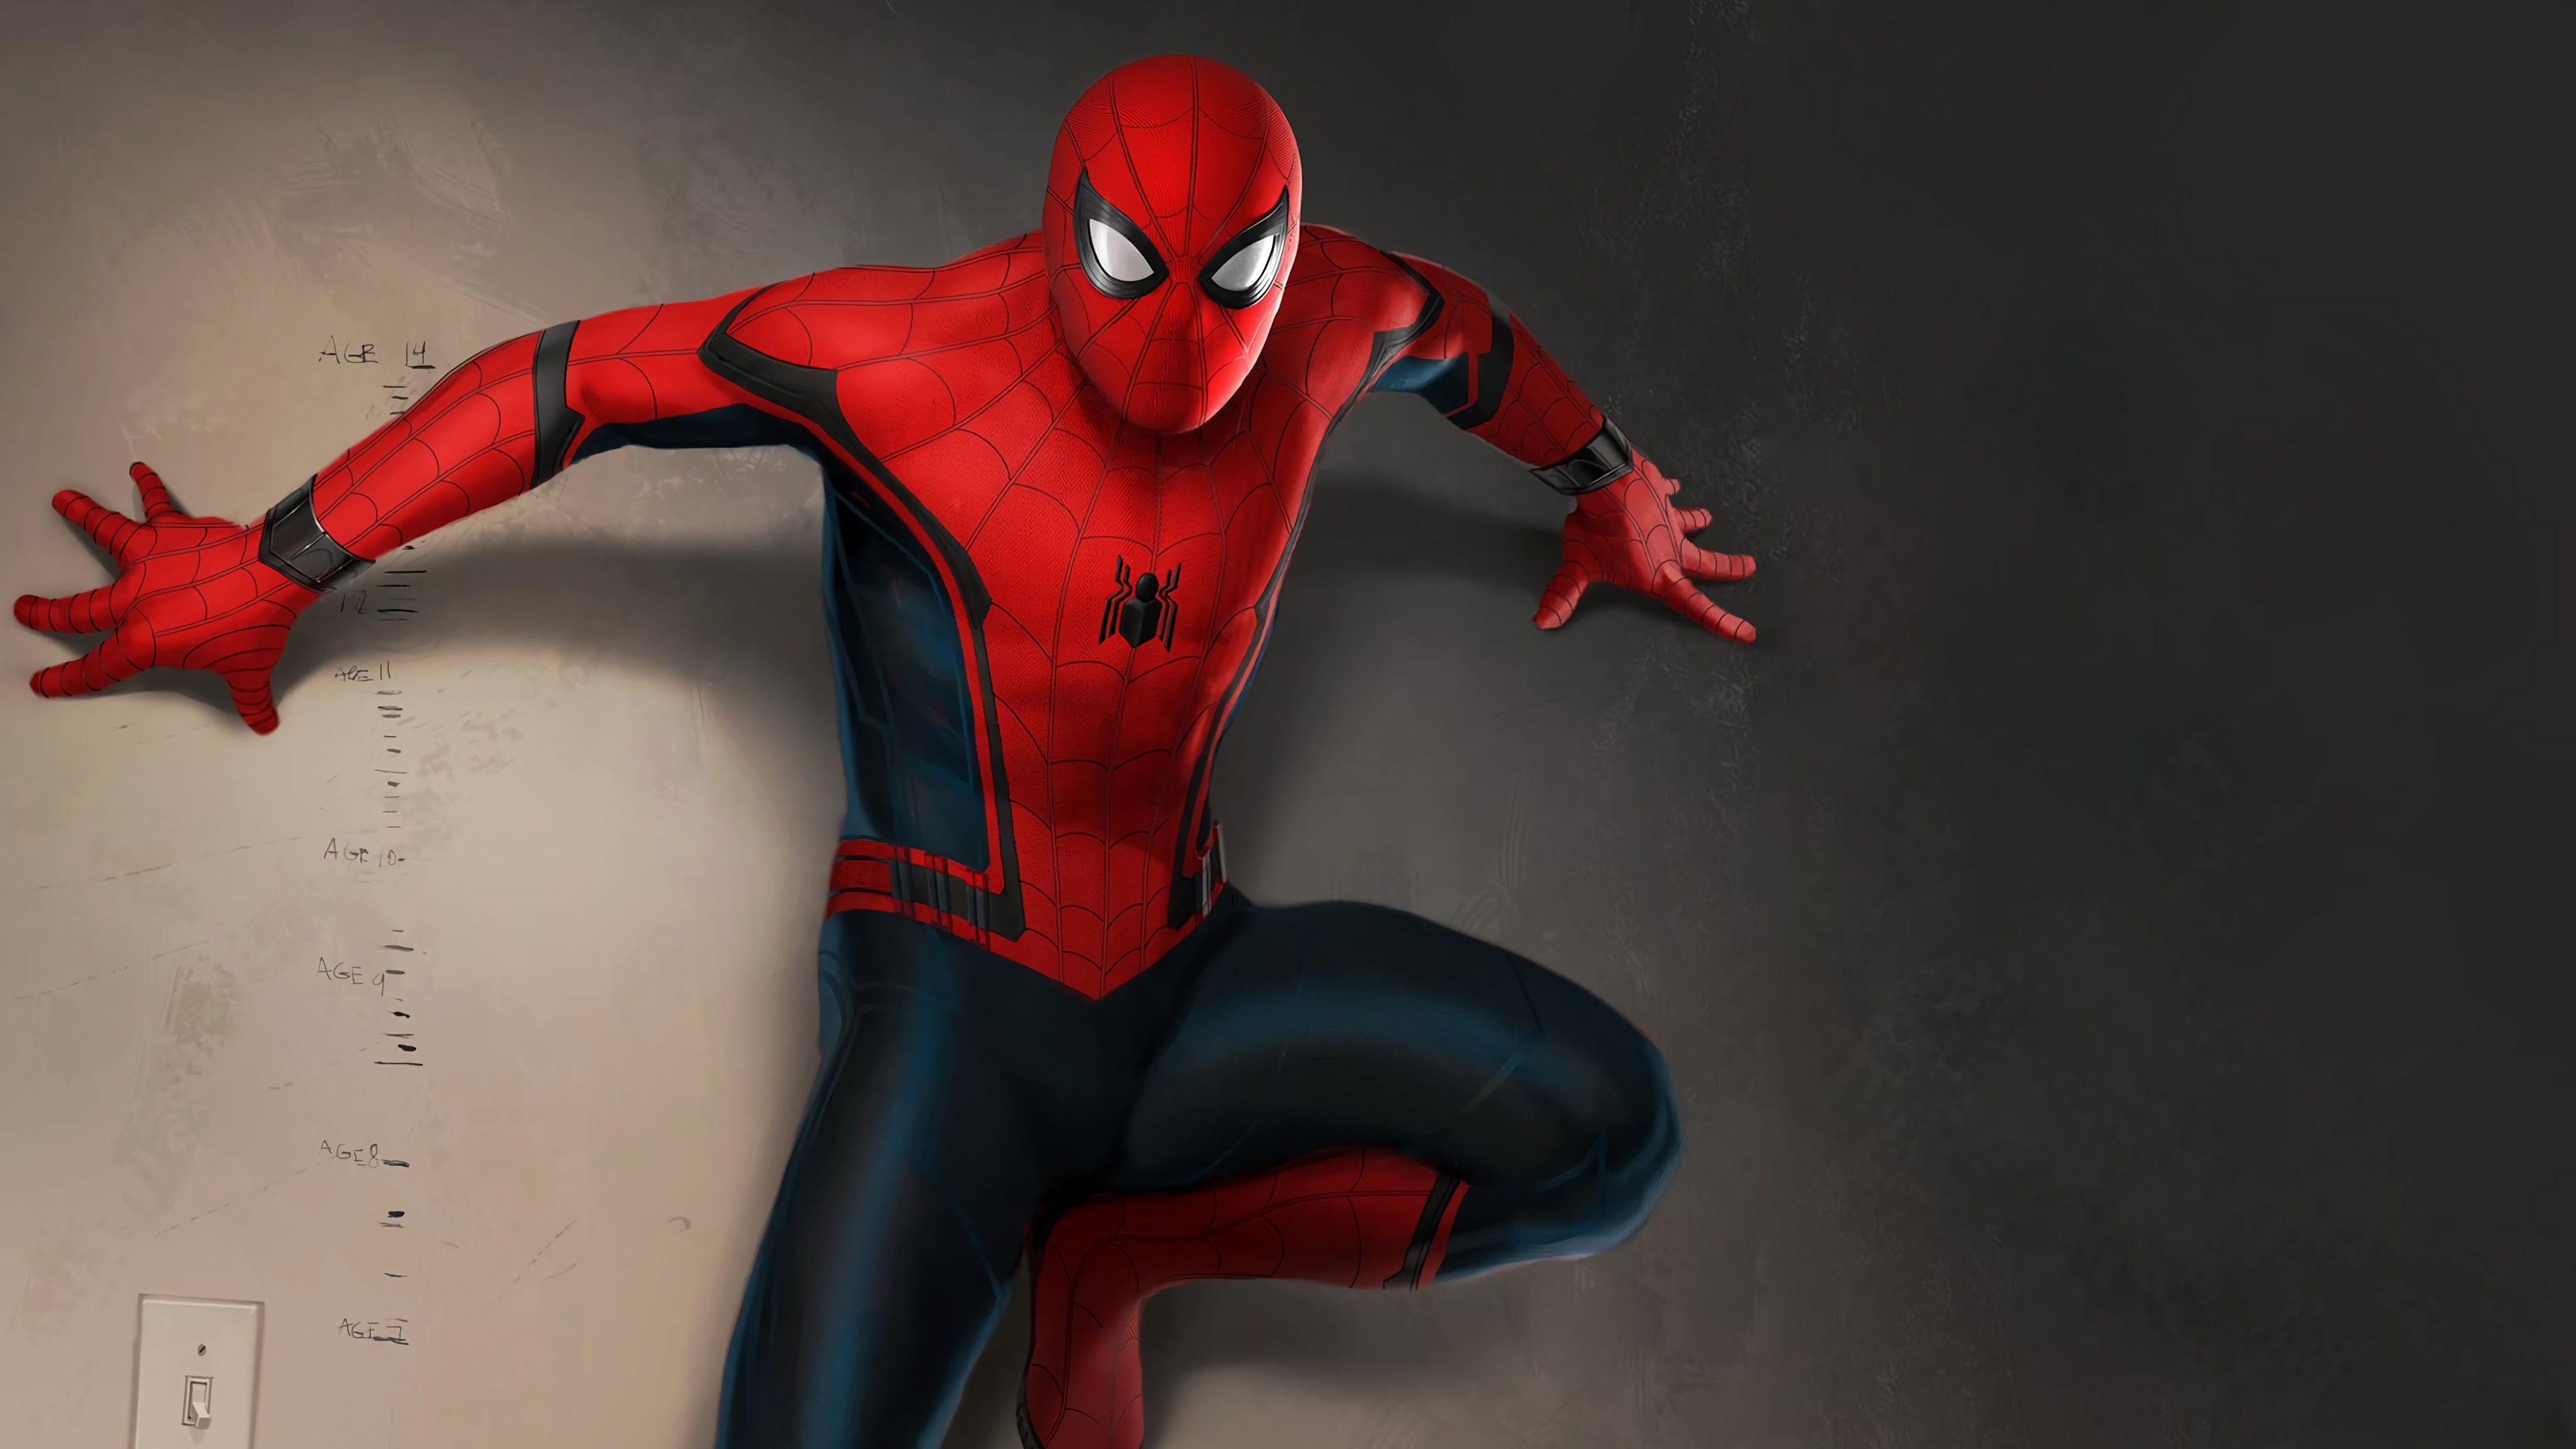 spiderman artnew 1568054843 - Spiderman Artnew - superheroes wallpapers, spiderman wallpapers, hd-wallpapers, digital art wallpapers, artwork wallpapers, artstation wallpapers, art wallpapers, 4k-wallpapers